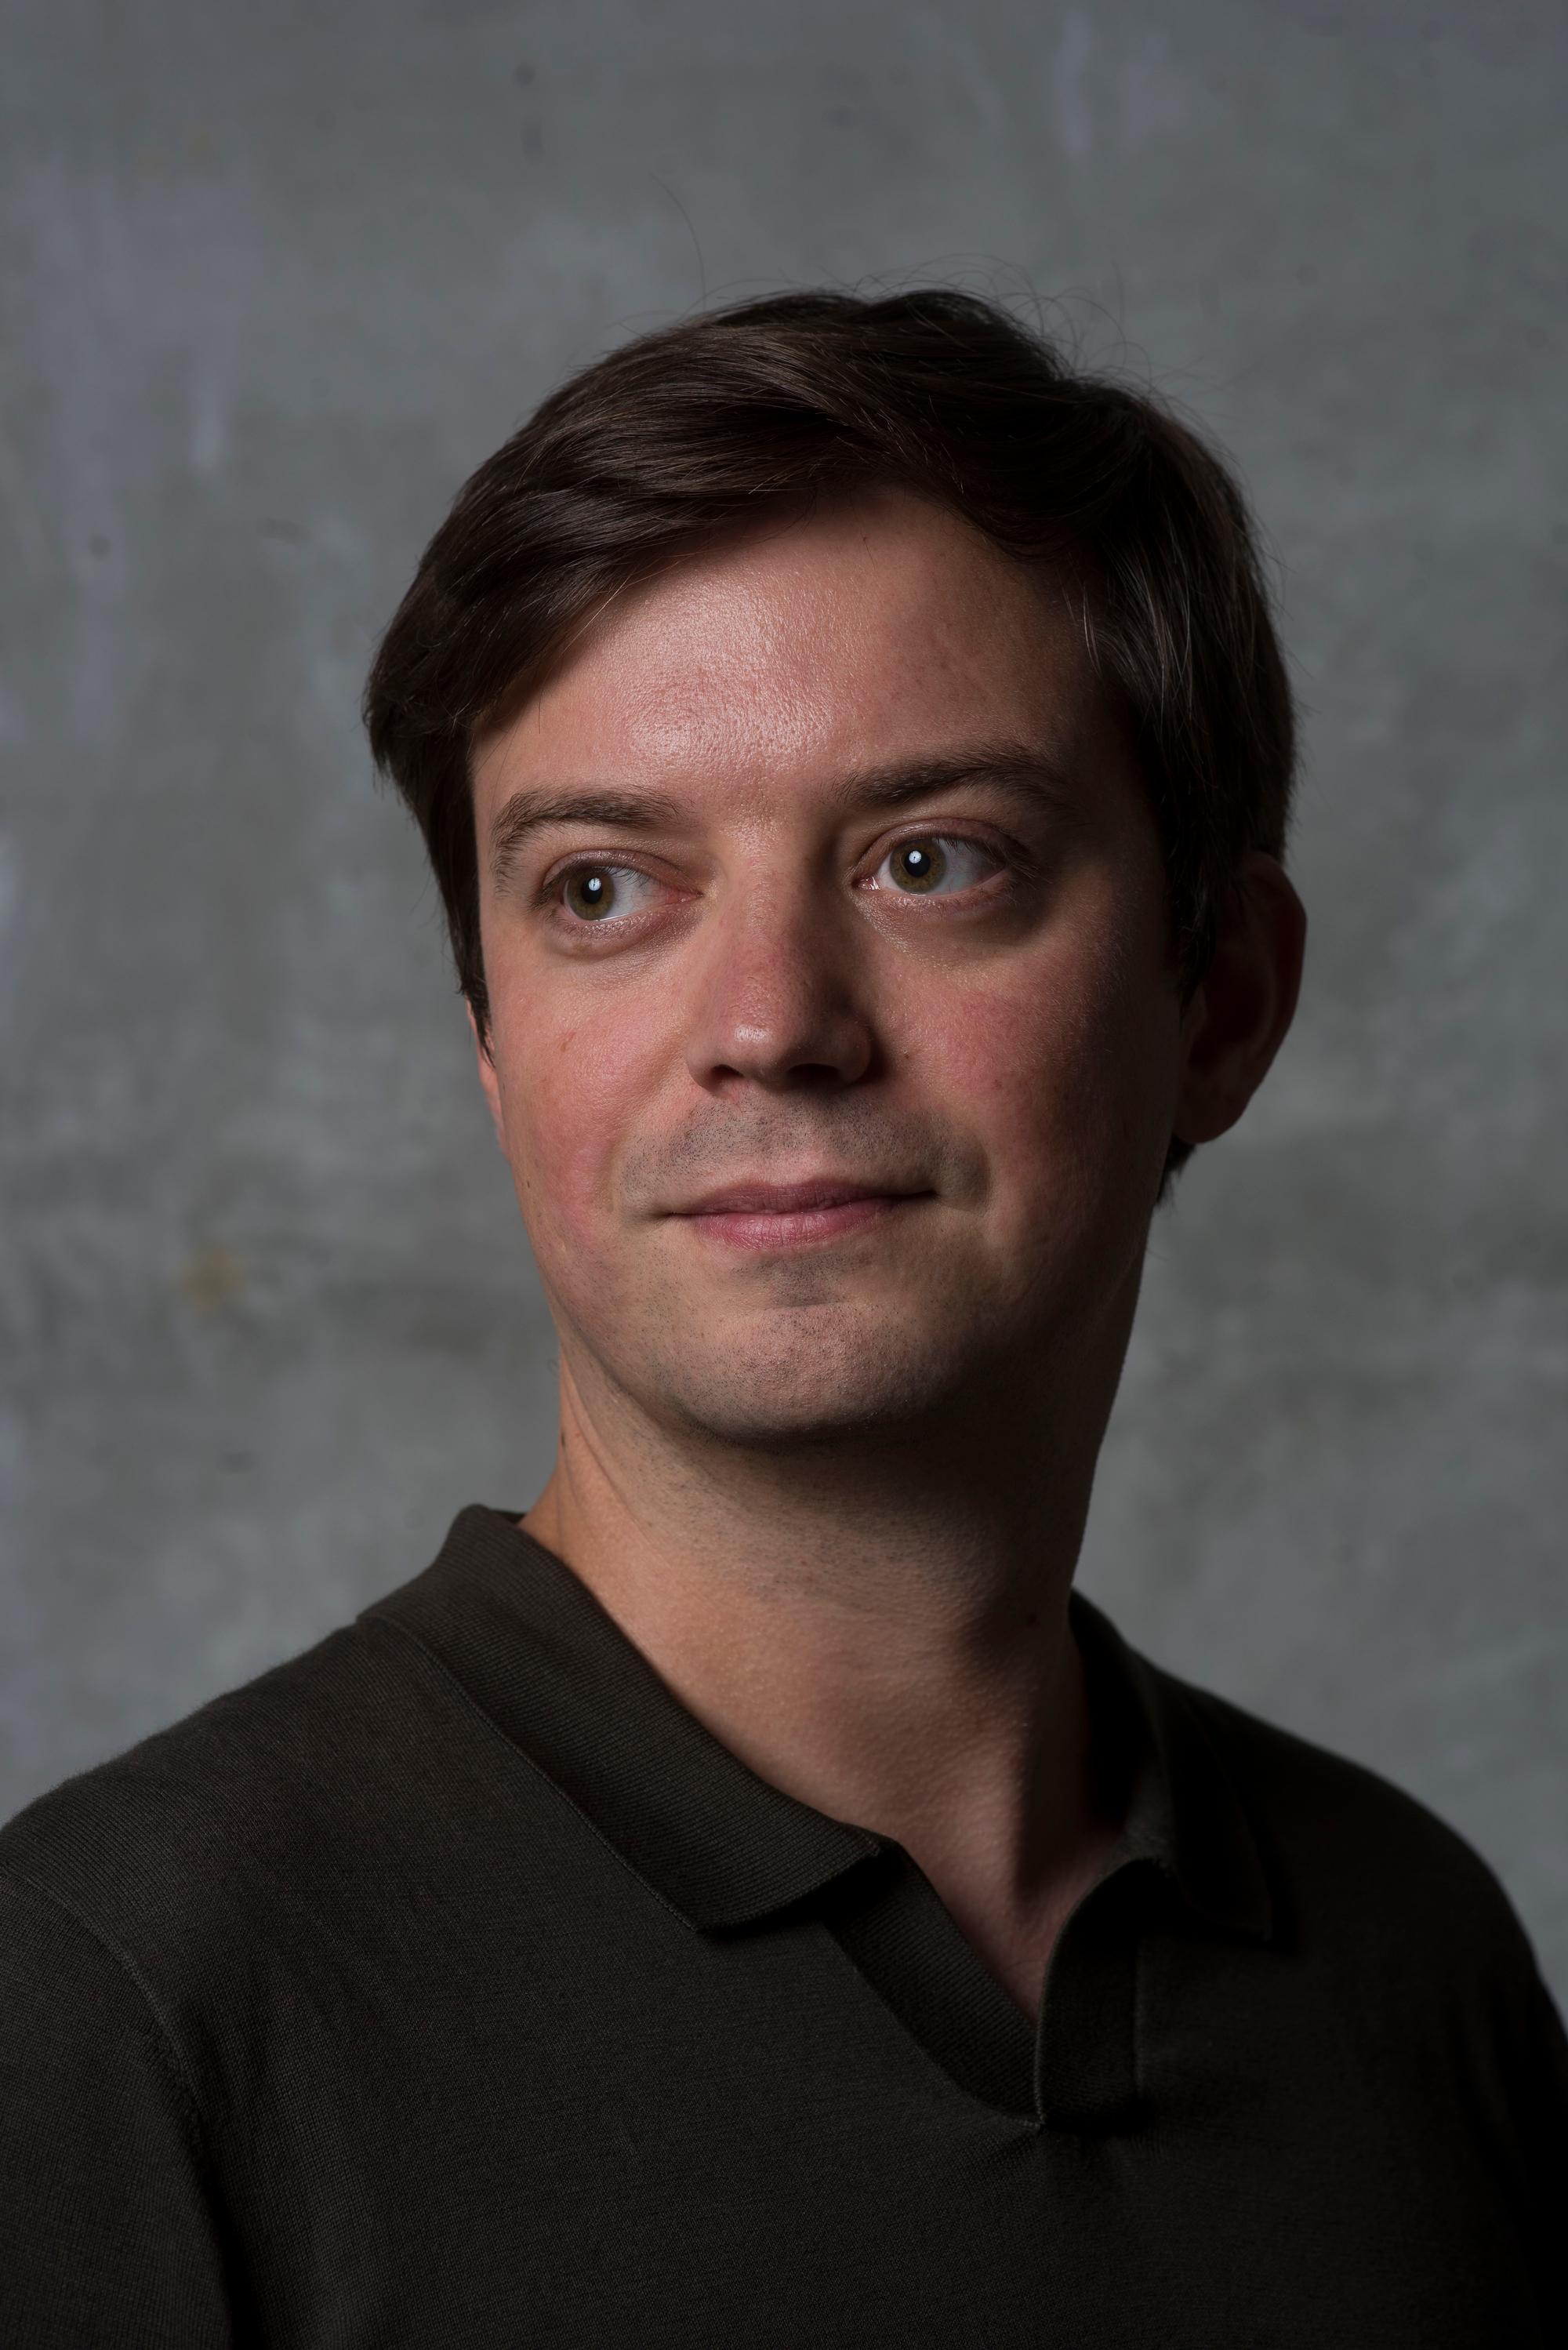 headshot of faculty Damjan Jovanovic